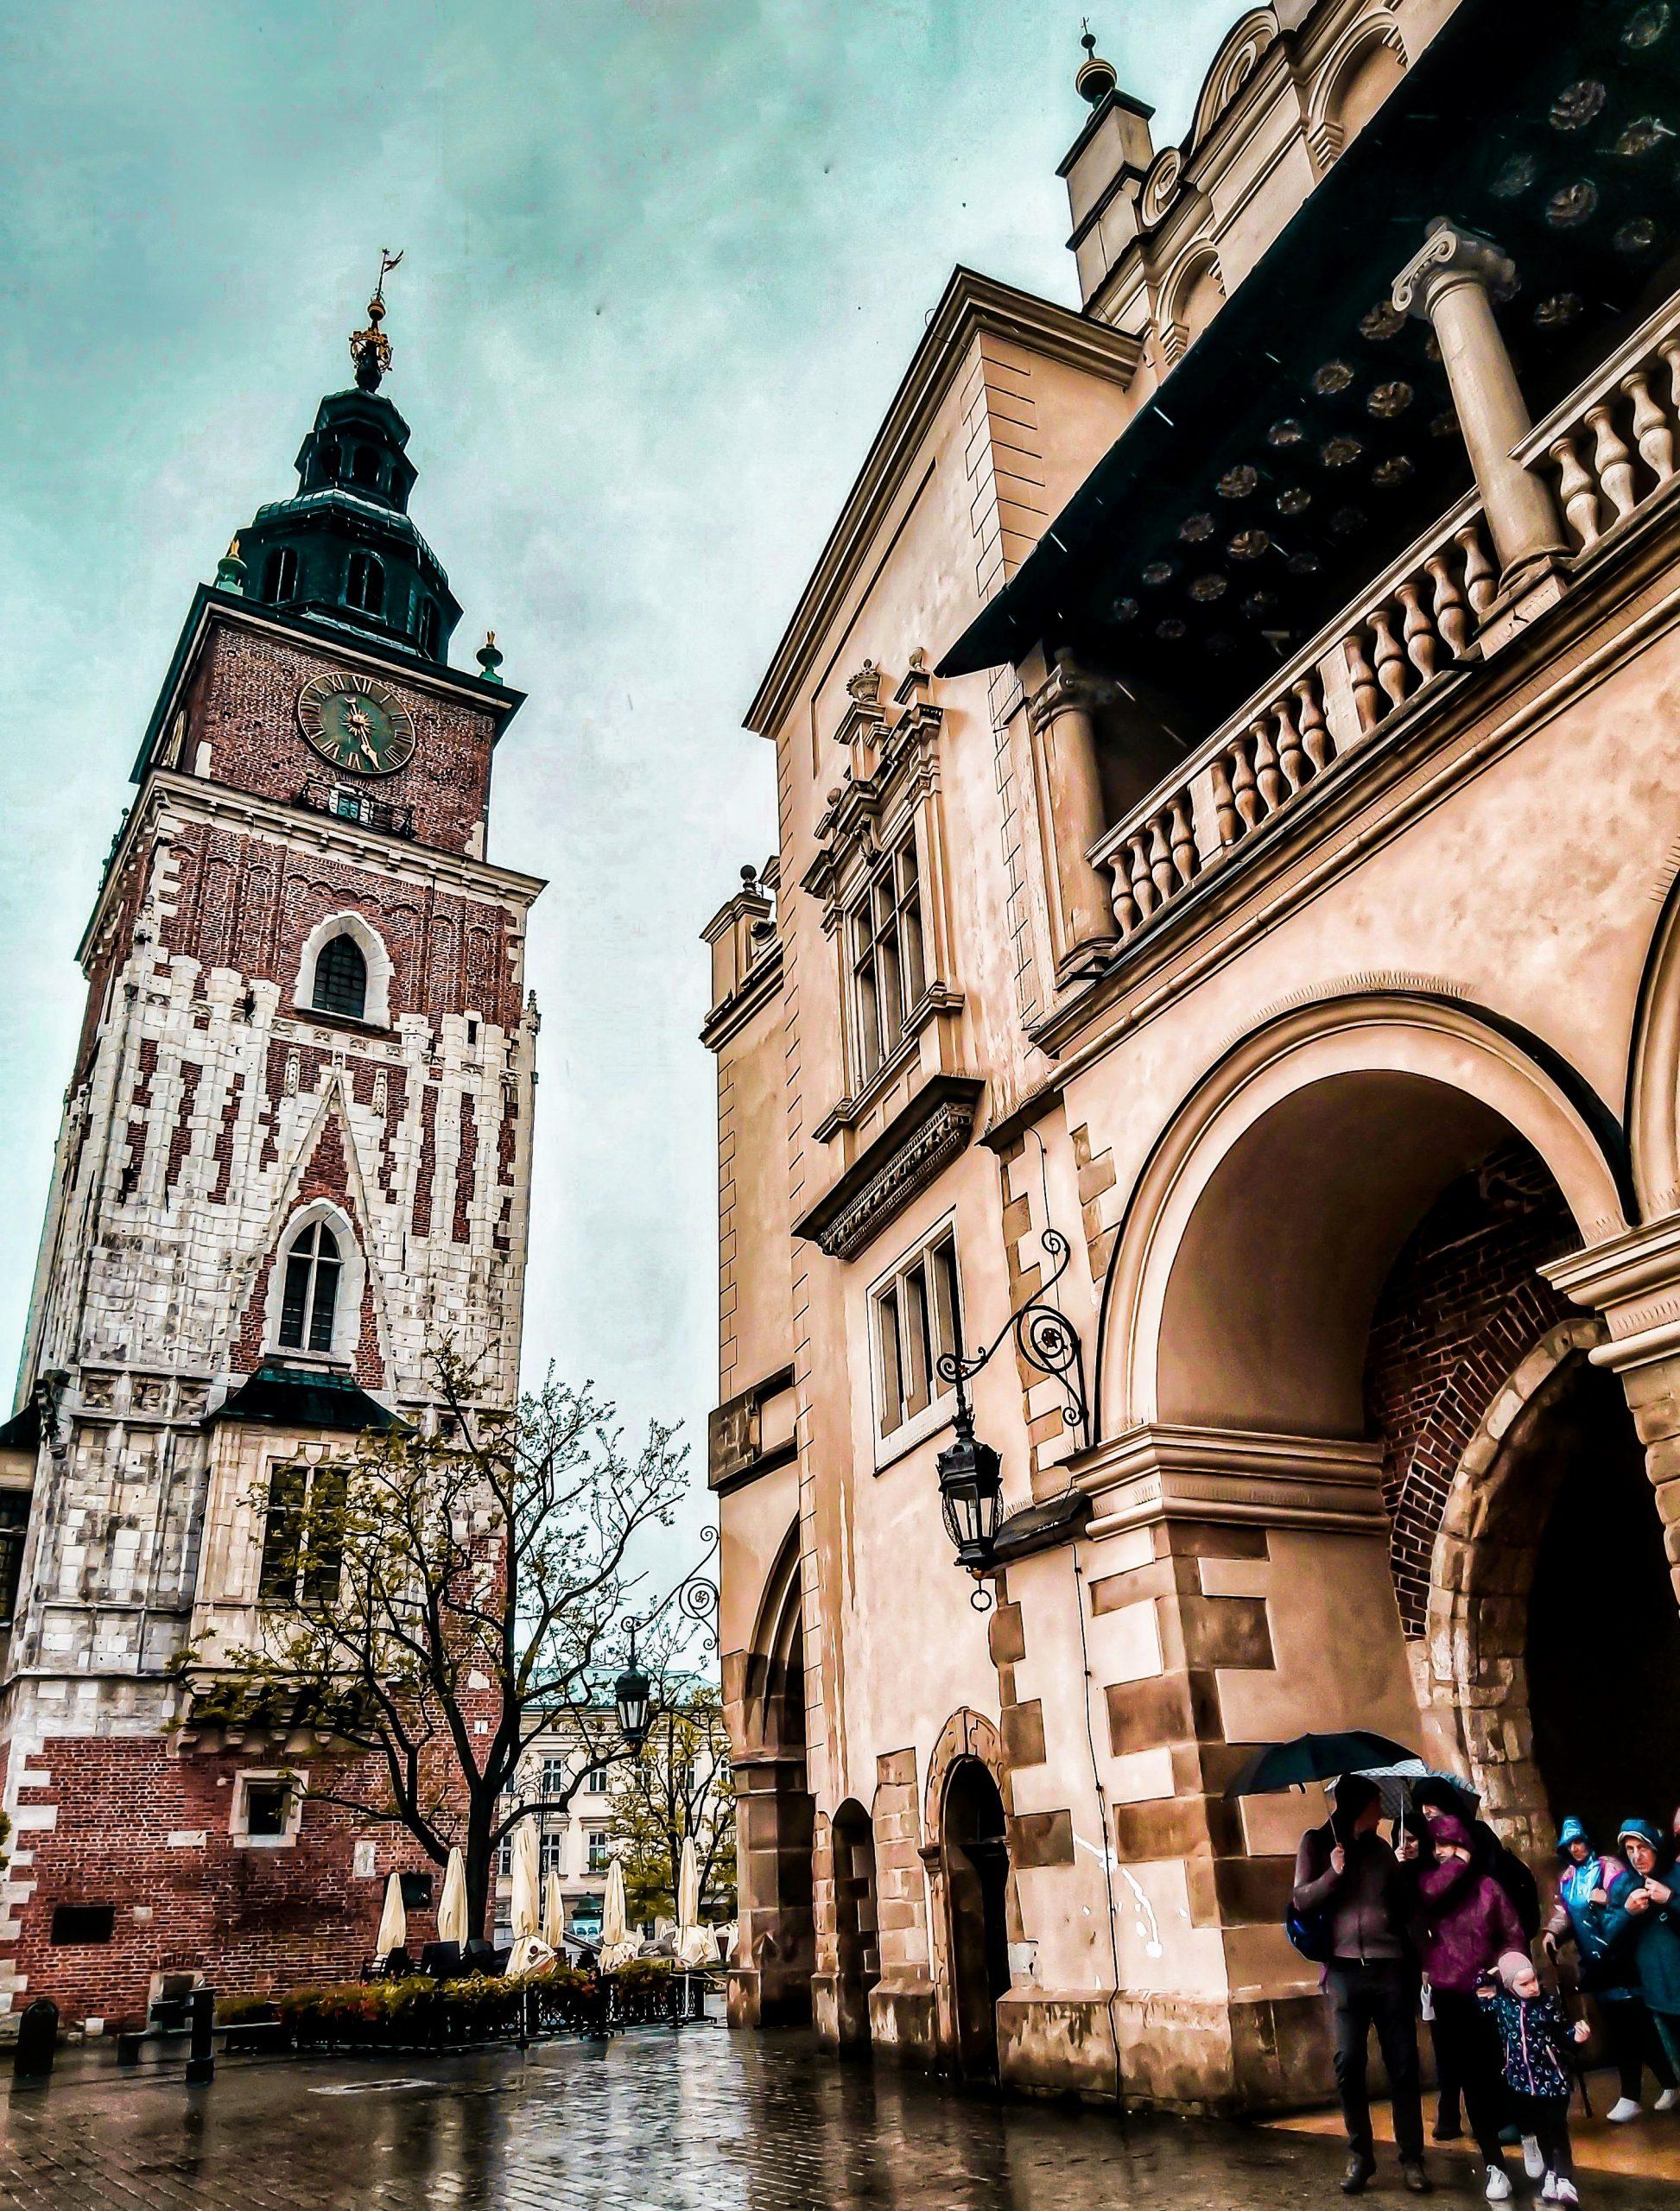 Castle Kingdom of Krakow, Poland.